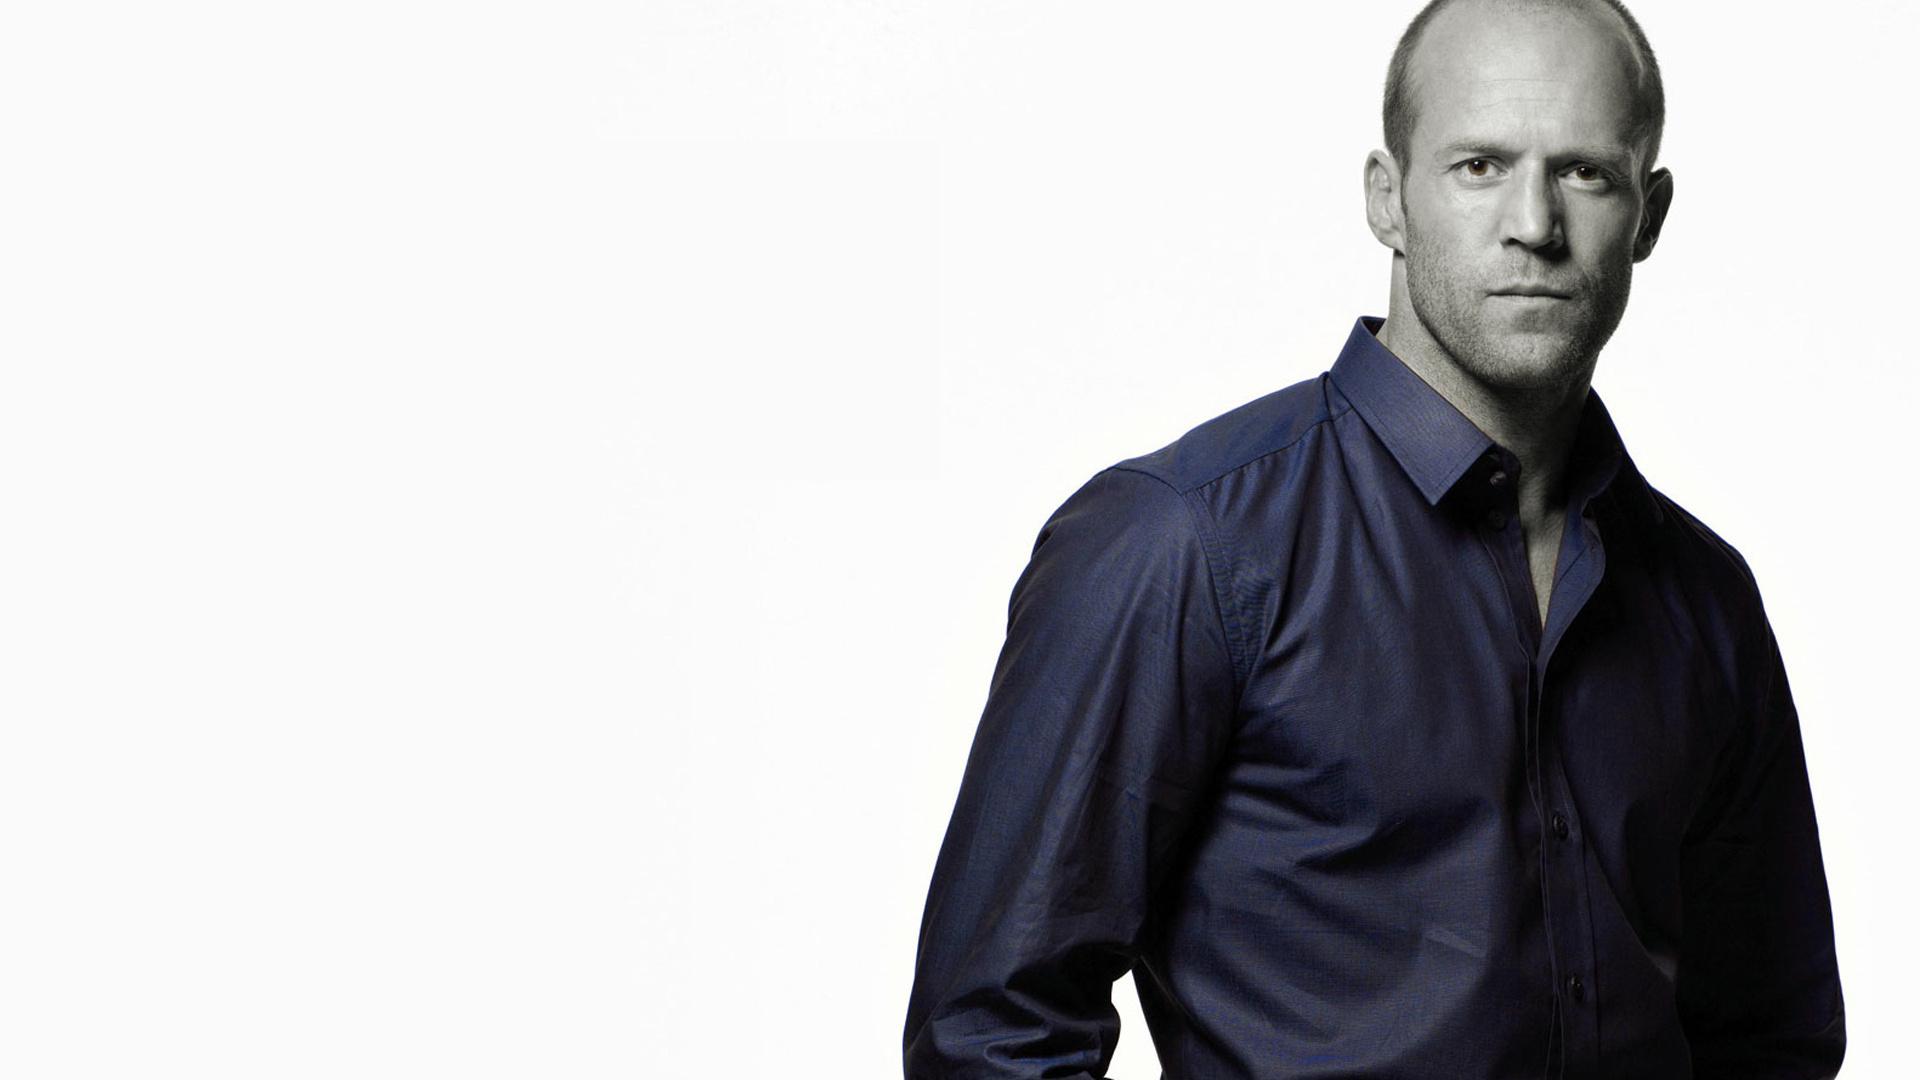 Jason Statham New Images Wallpaper HD Celebrities 4K Wallpapers 1920x1080